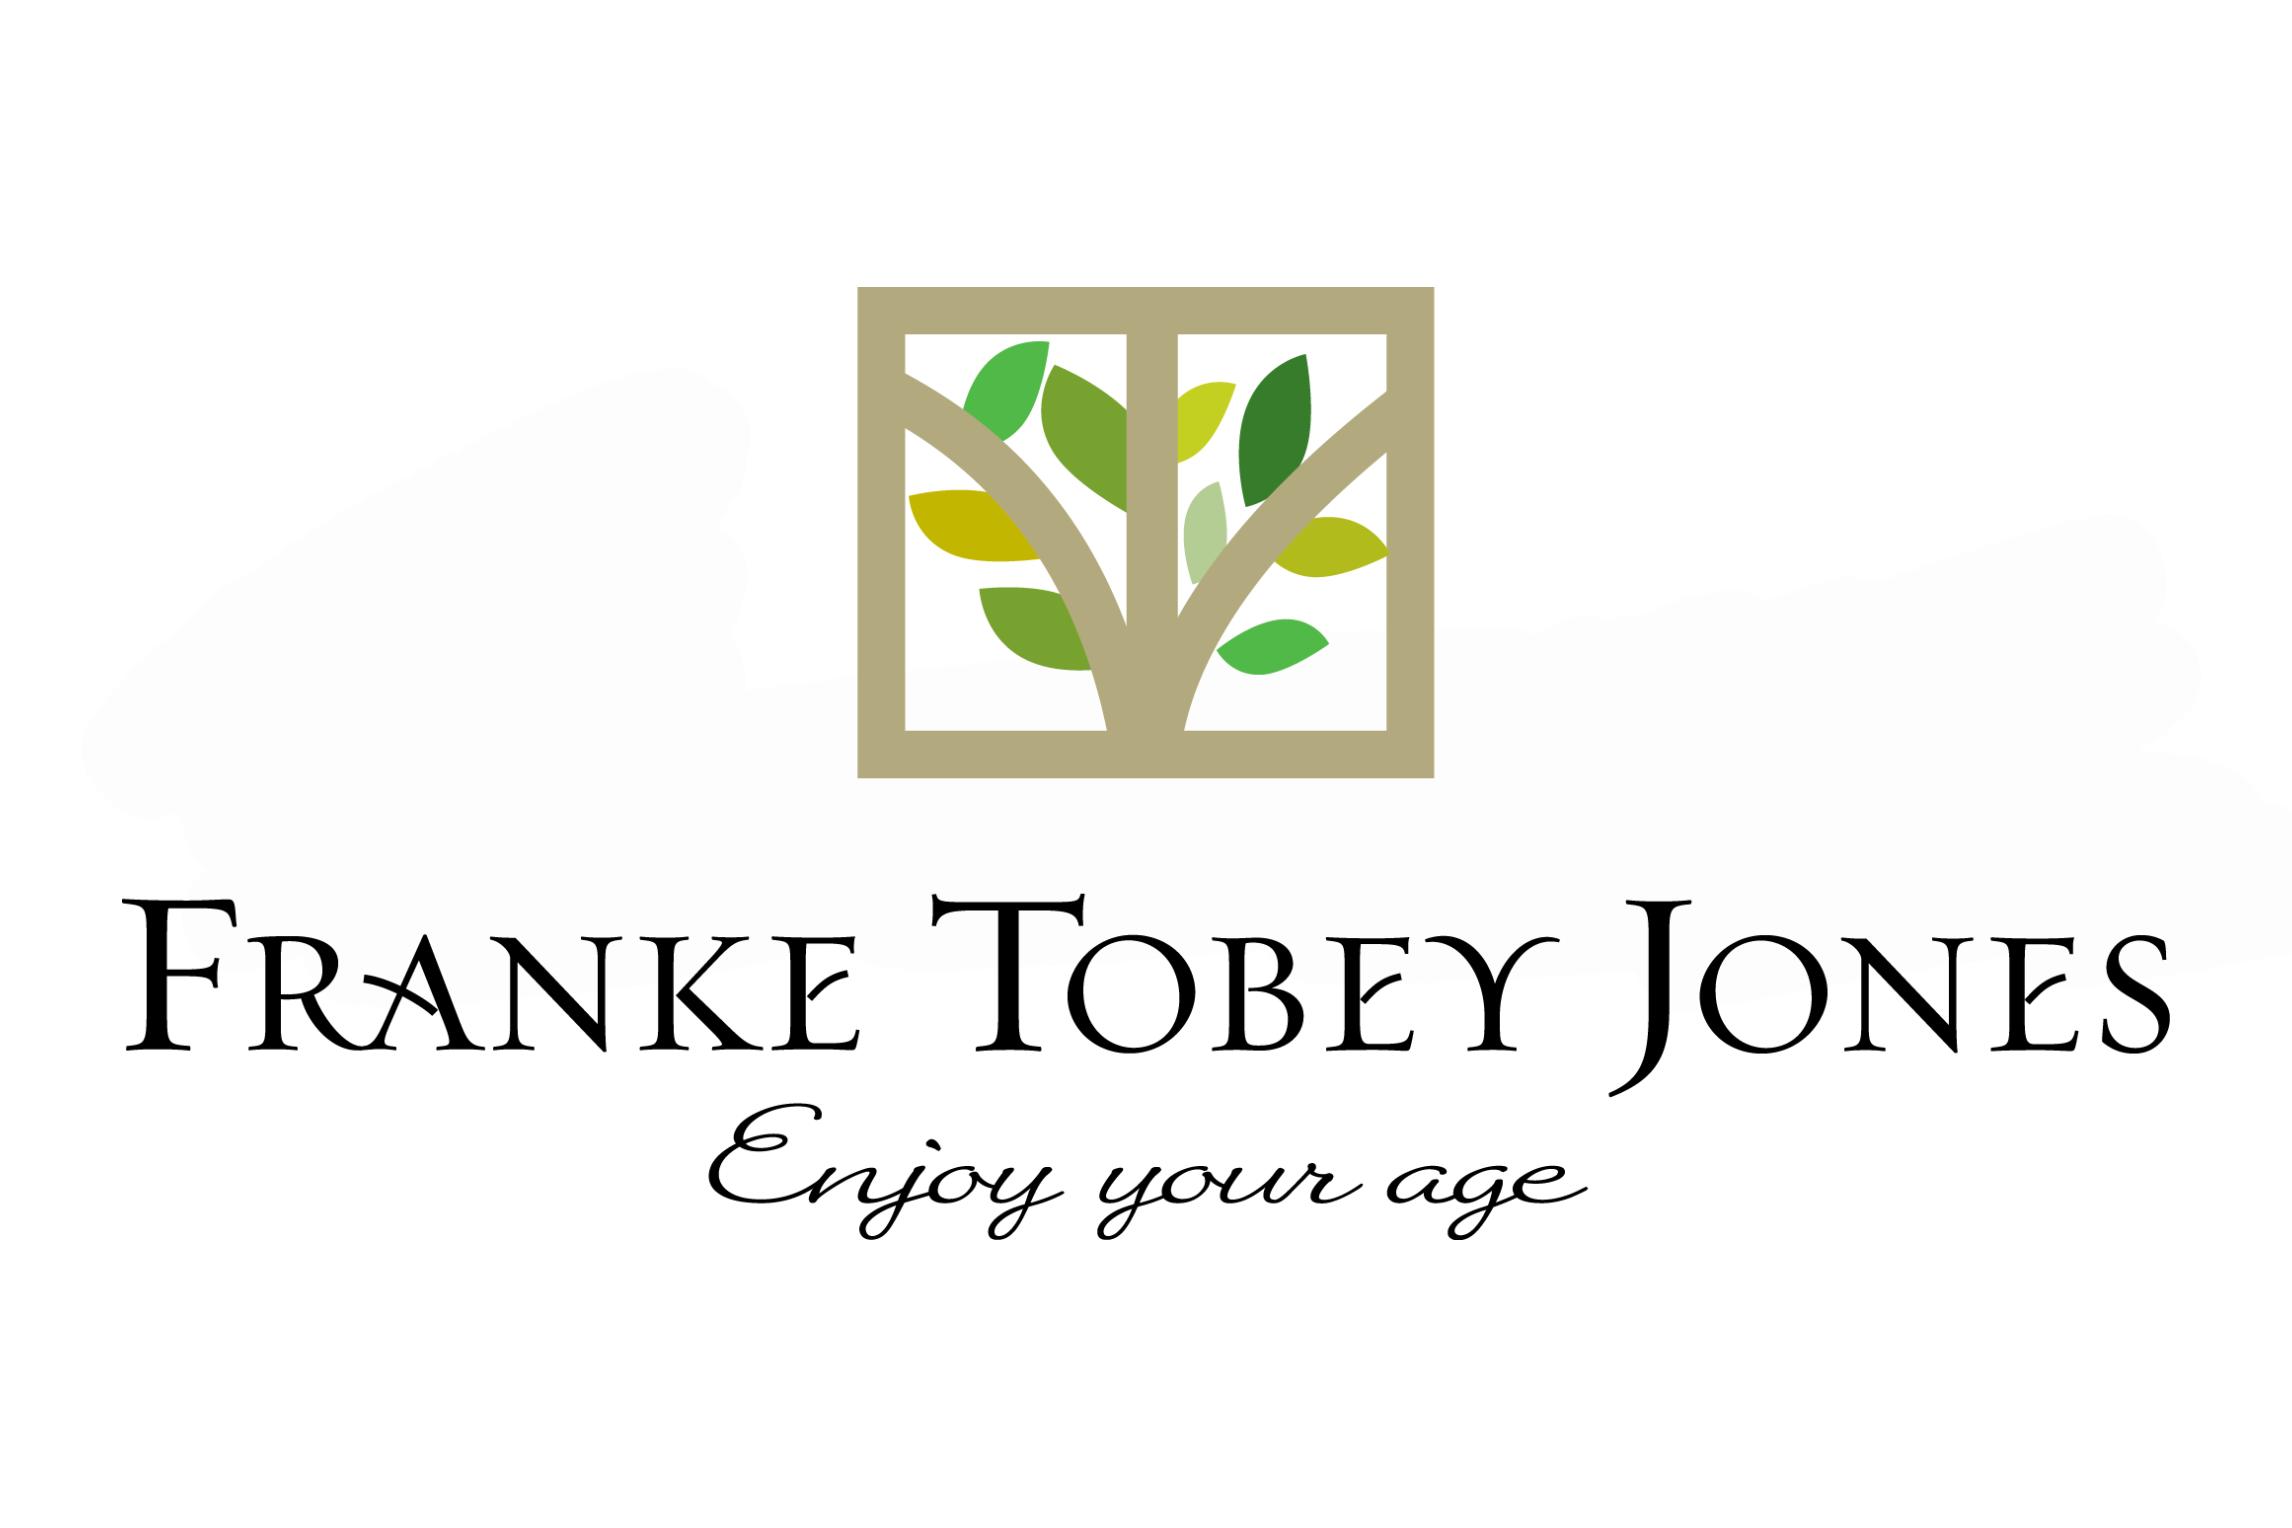 franketobey-jones